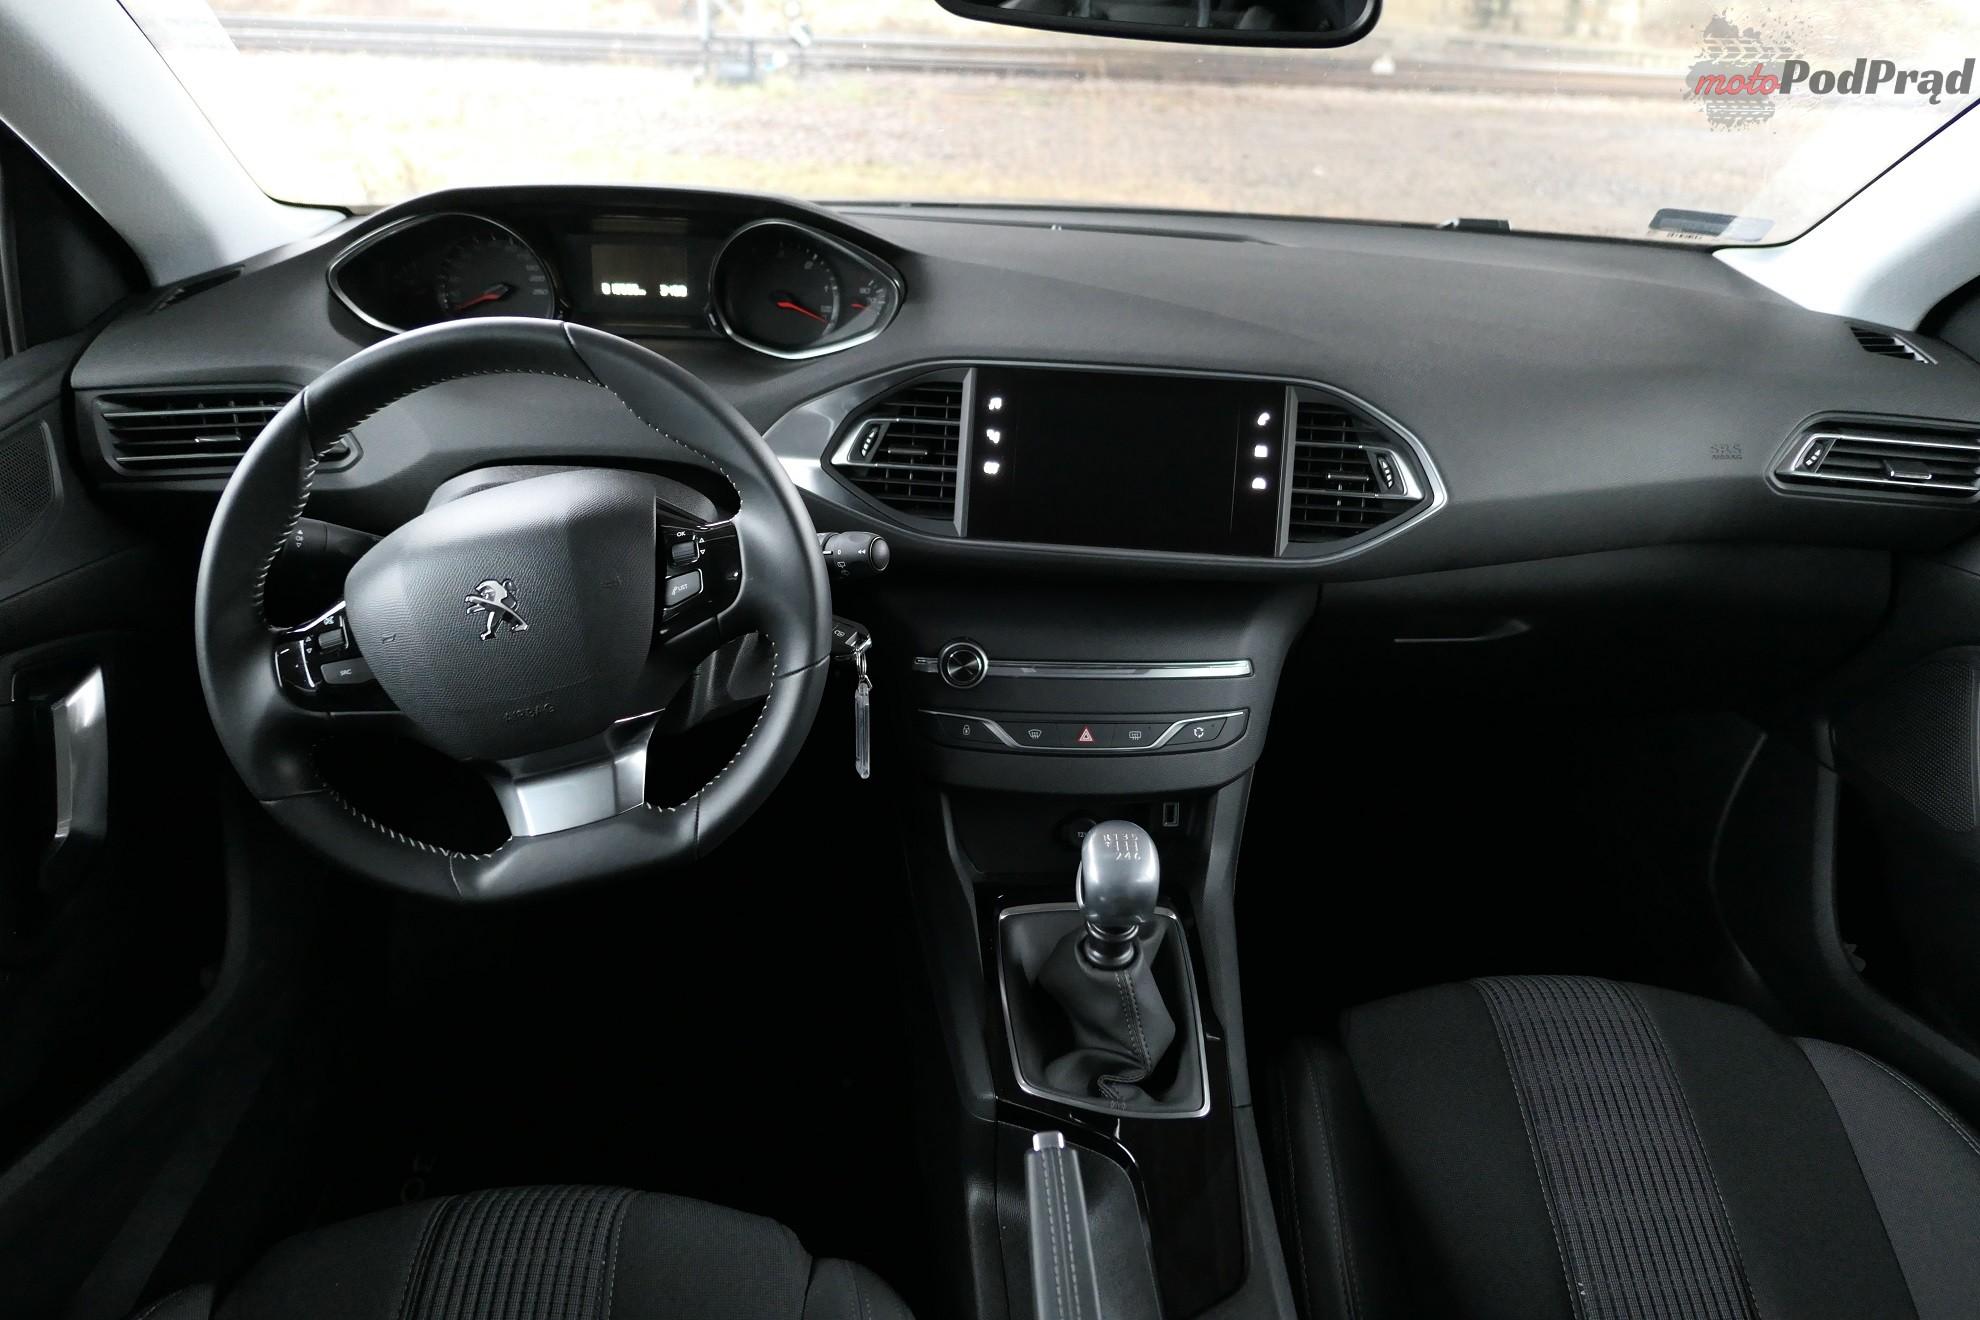 Peugeot 308 SW 17 Test: Peugeot 308 SW 120 KM   potrafi podrapać